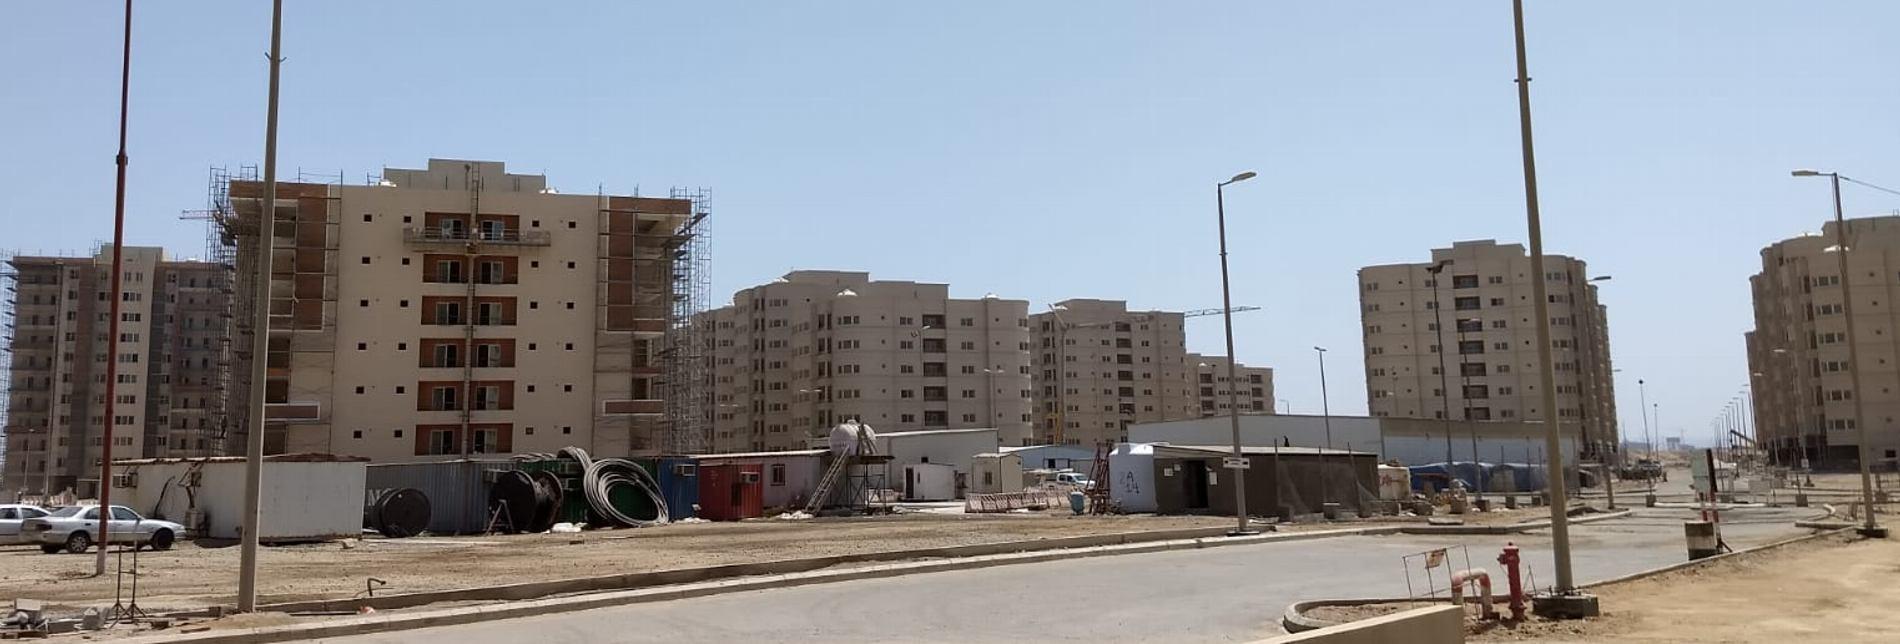 Asie Al Raidah Housing Complex Project Djeddah Arabie S